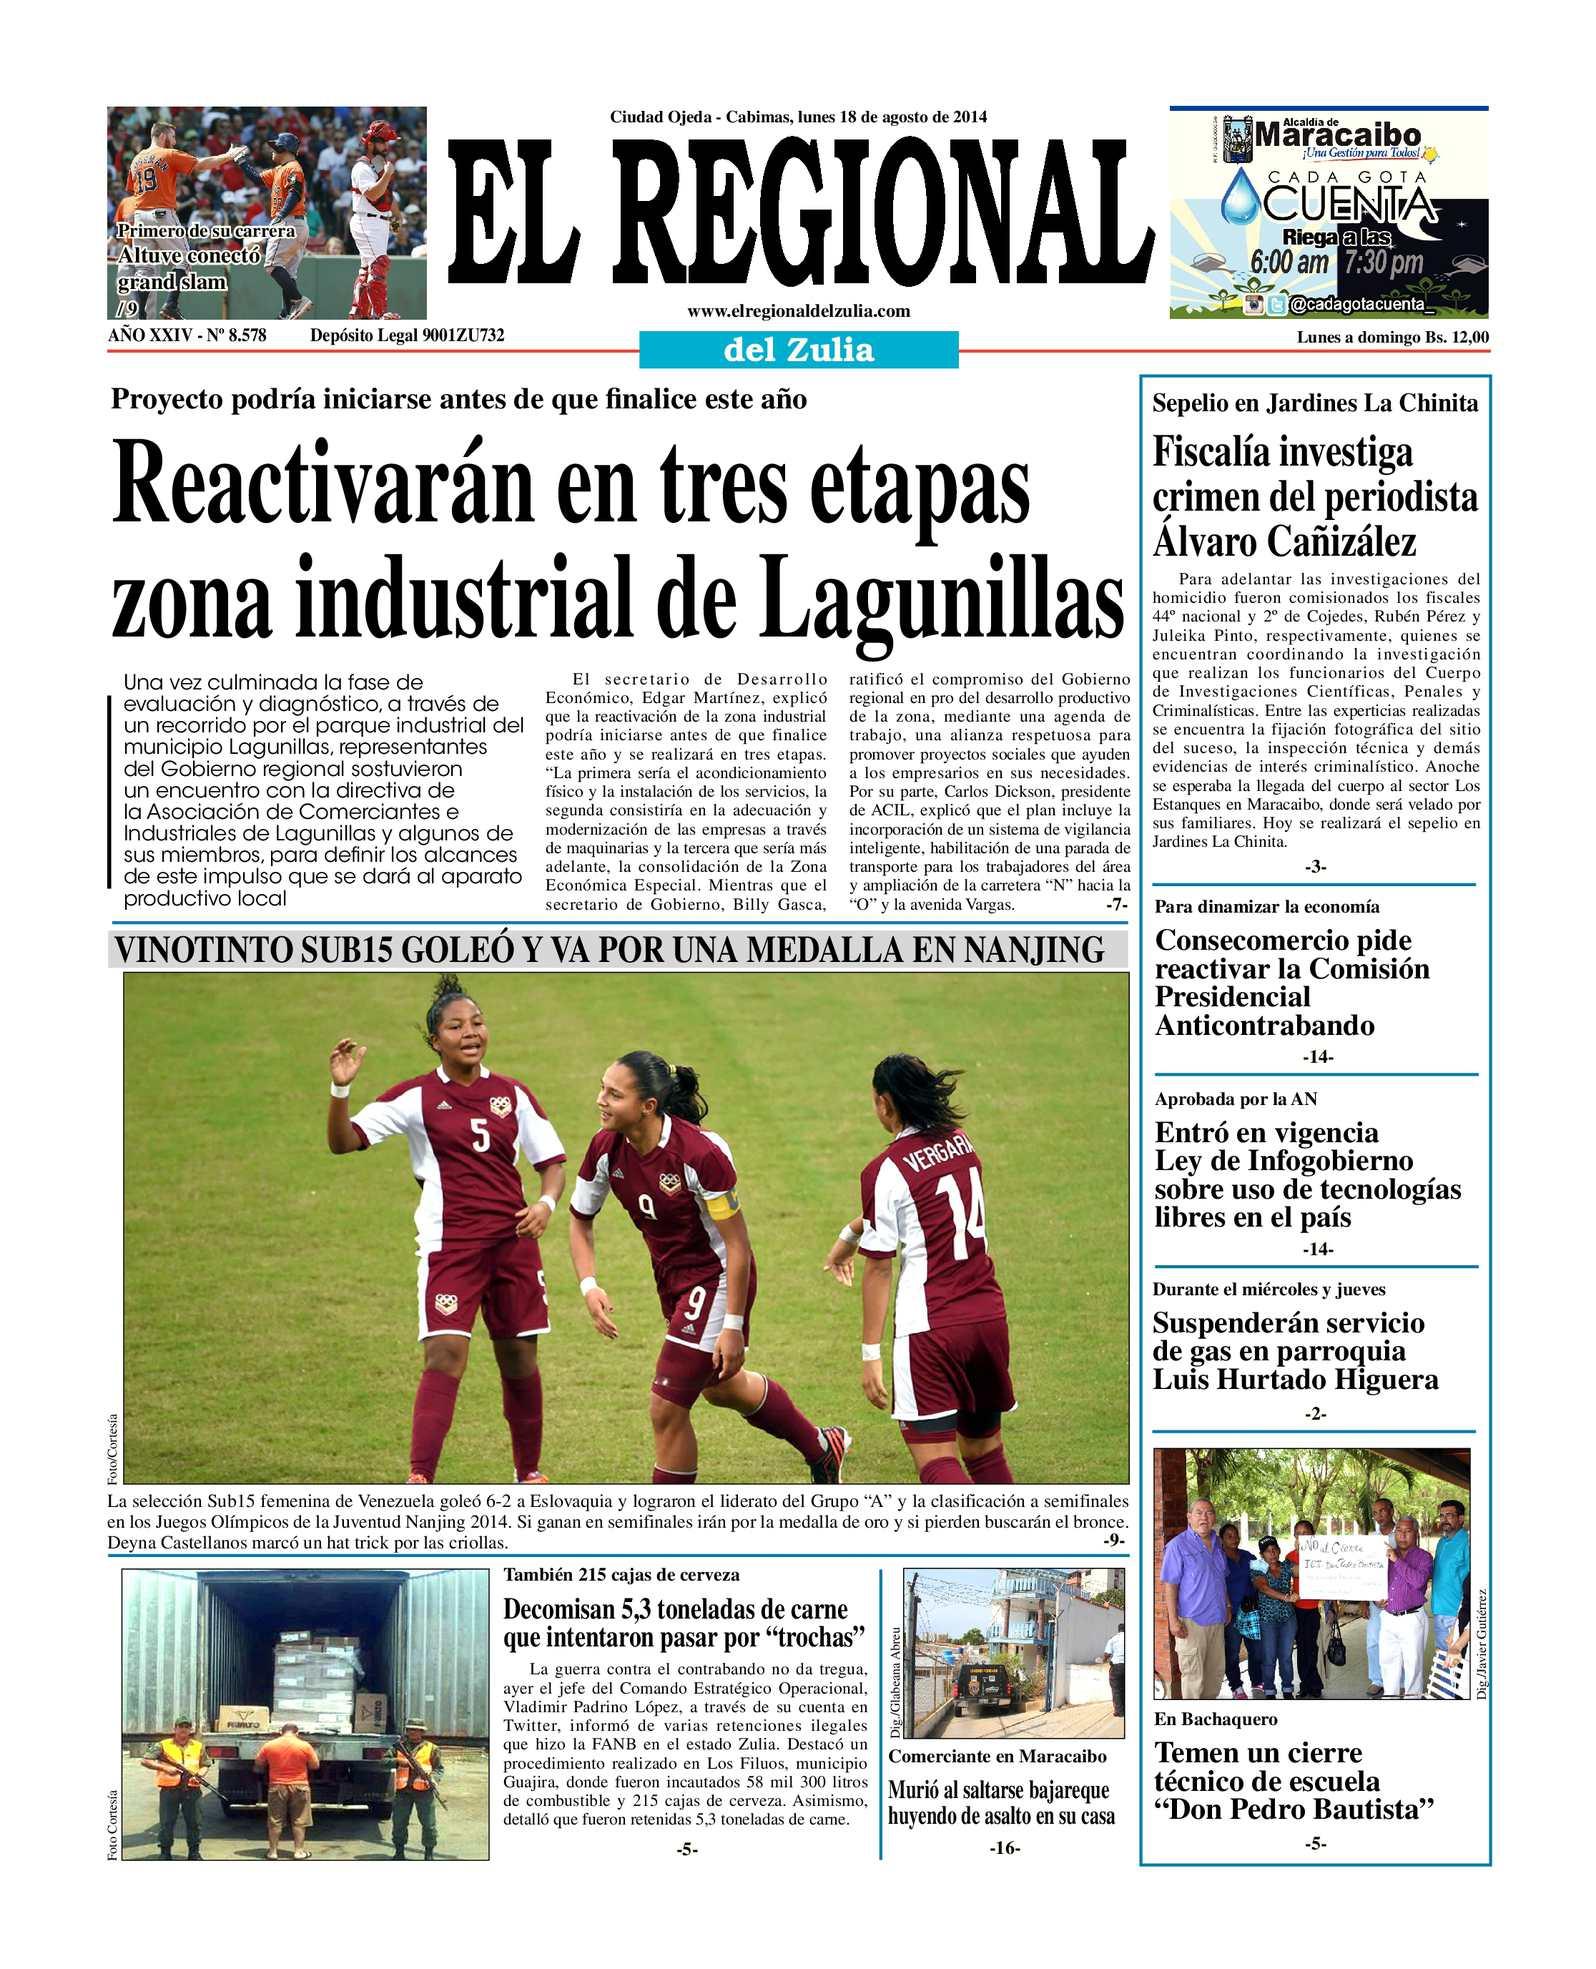 Calaméo - El Regional del Zulia 18-08-2014